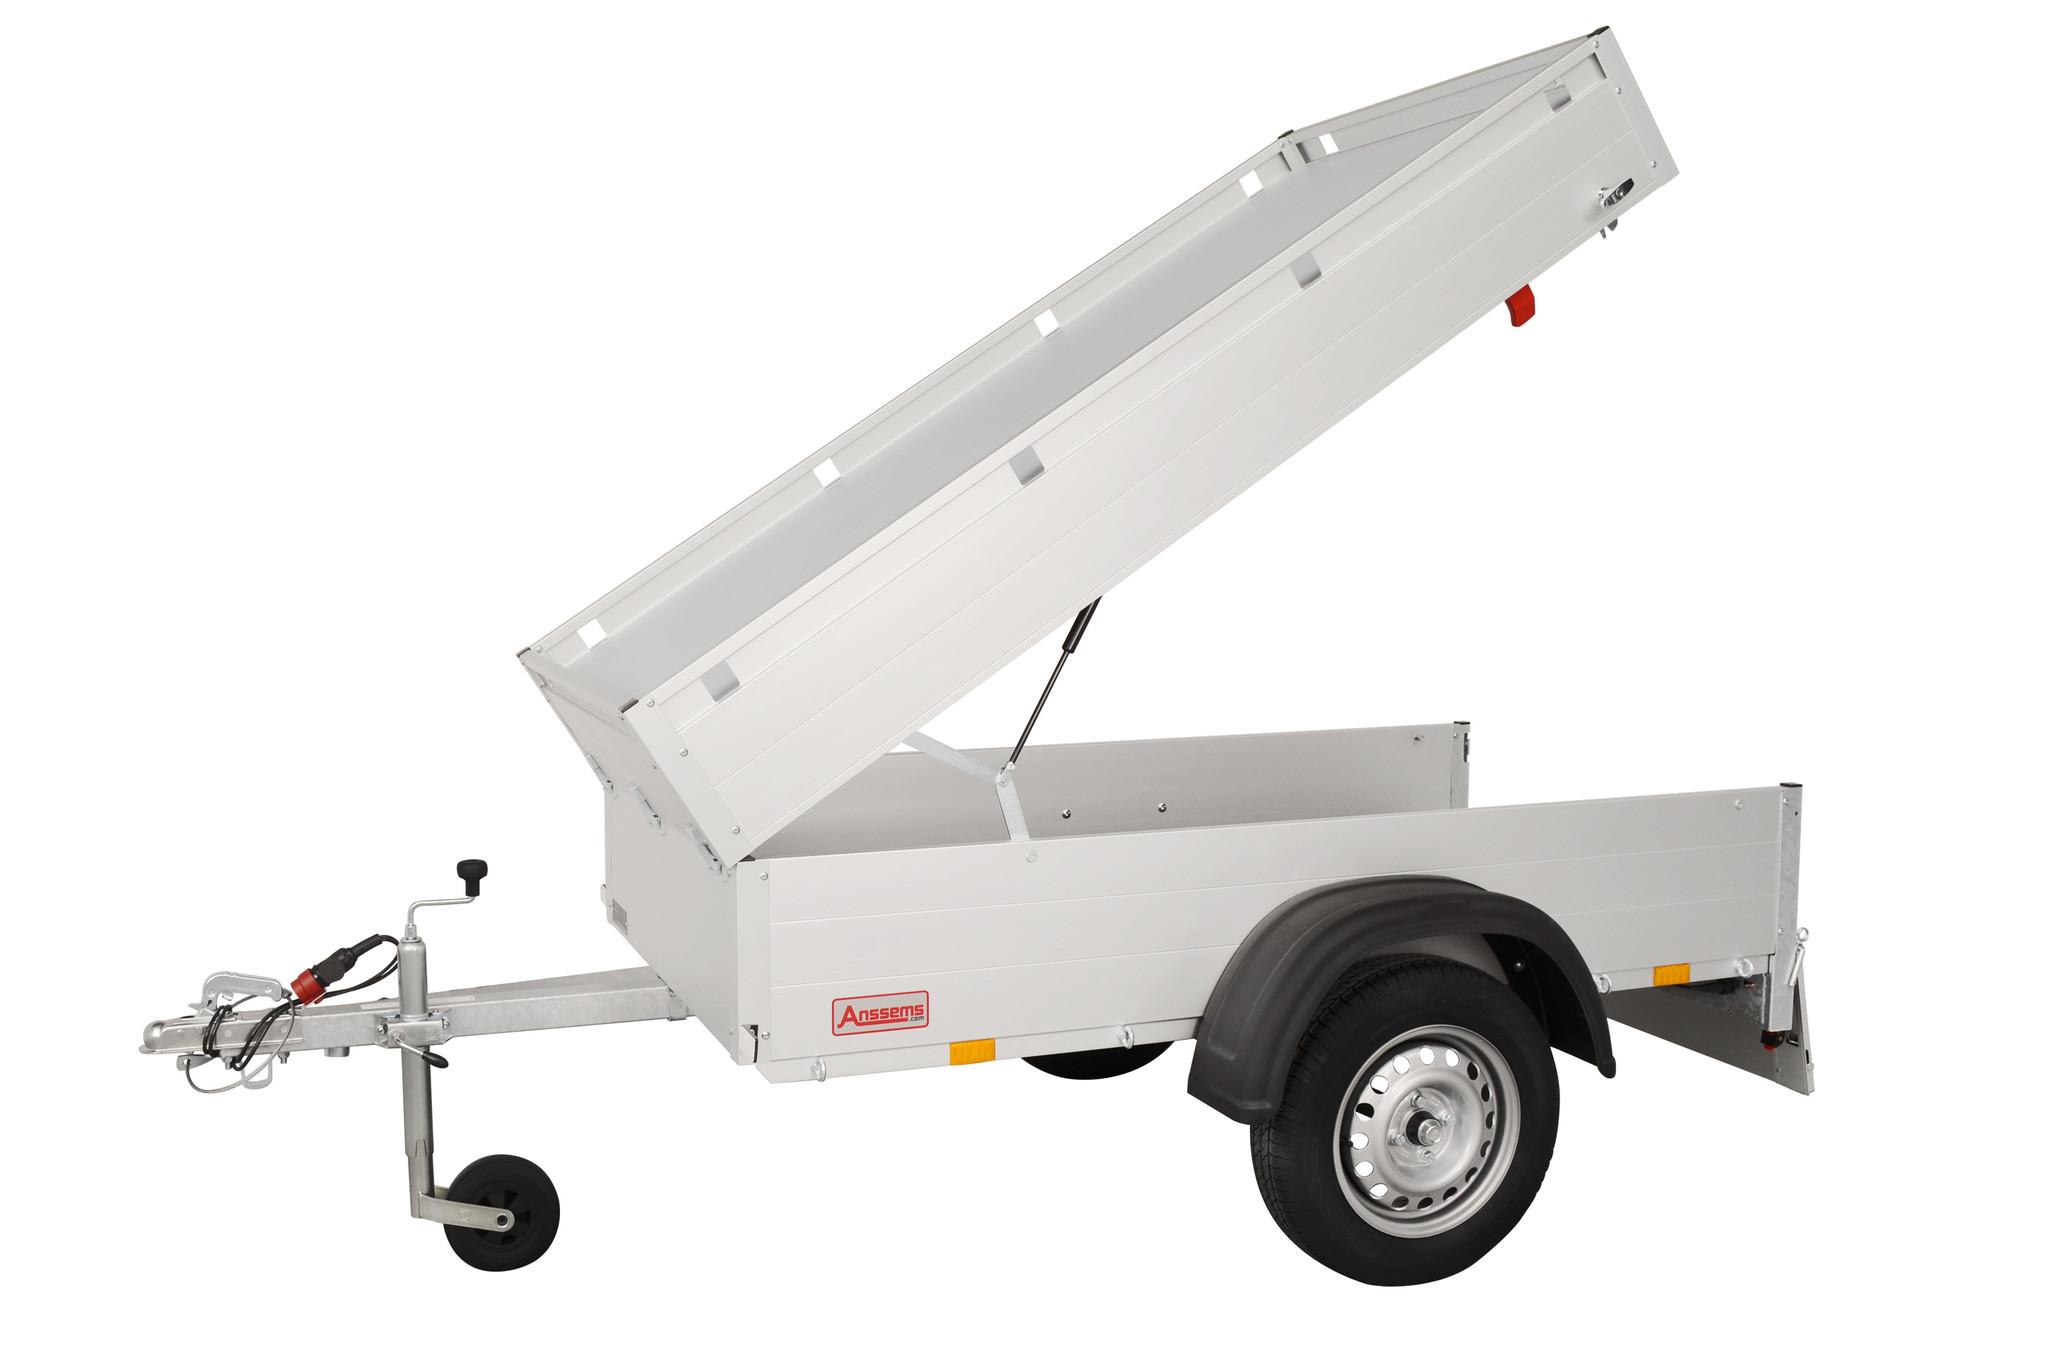 Anssems Anssems GT 500 bagagewagen - 500 kg bruto laadvermogen - 151x101x48 cm laadoppervlak - ongeremd - inclusief deksel